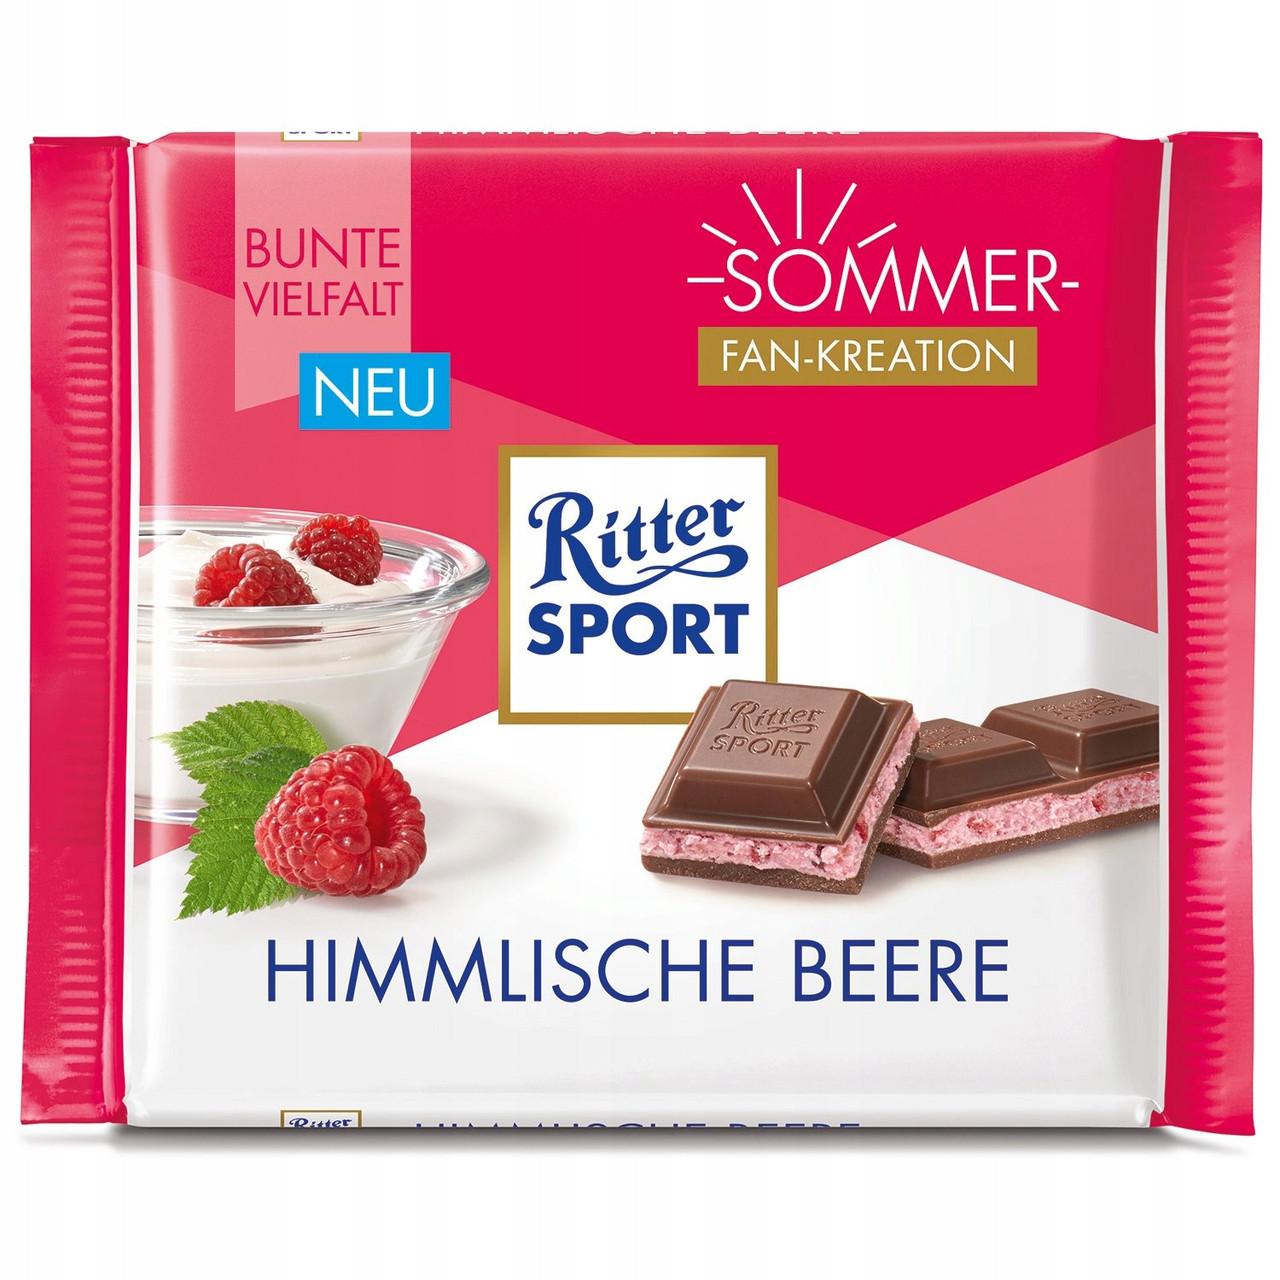 Шоколад Ritter Sport Himmlische Beere (Риттер Спорт малина и йогурт), 100 г